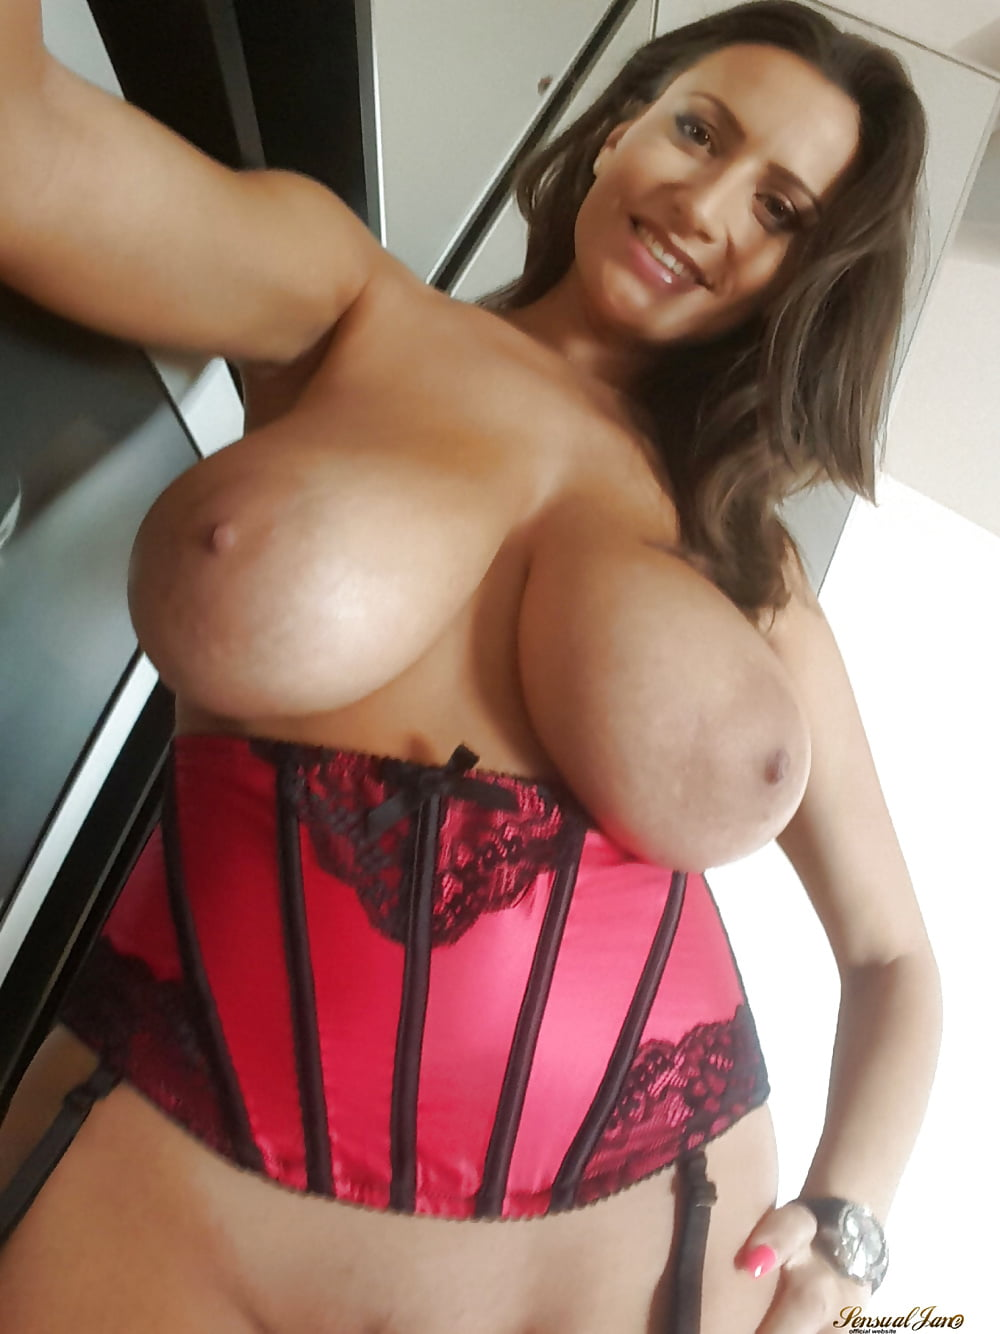 Does sensual jane escort ebony hooker leonian golf indonesia online shop